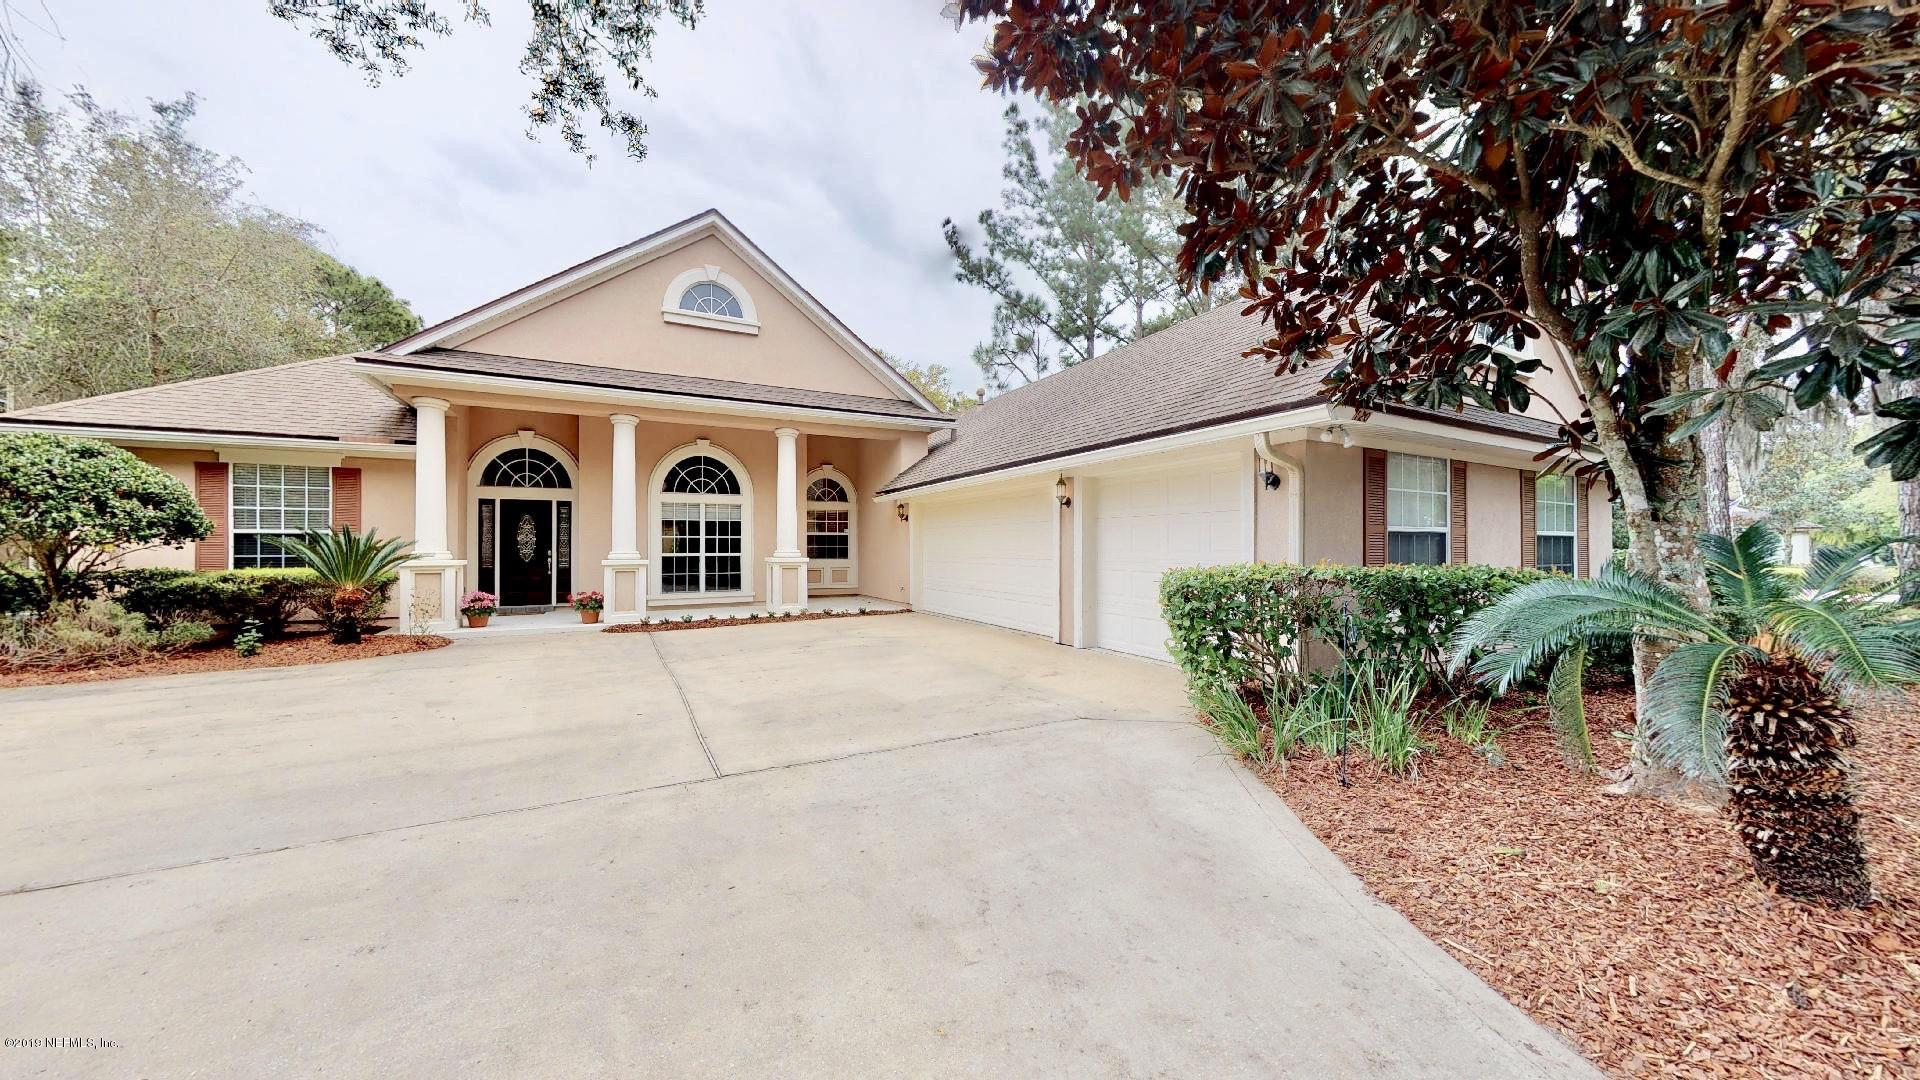 120 PARKSIDE, ST AUGUSTINE, FLORIDA 32095, 4 Bedrooms Bedrooms, ,4 BathroomsBathrooms,Residential - single family,For sale,PARKSIDE,985765